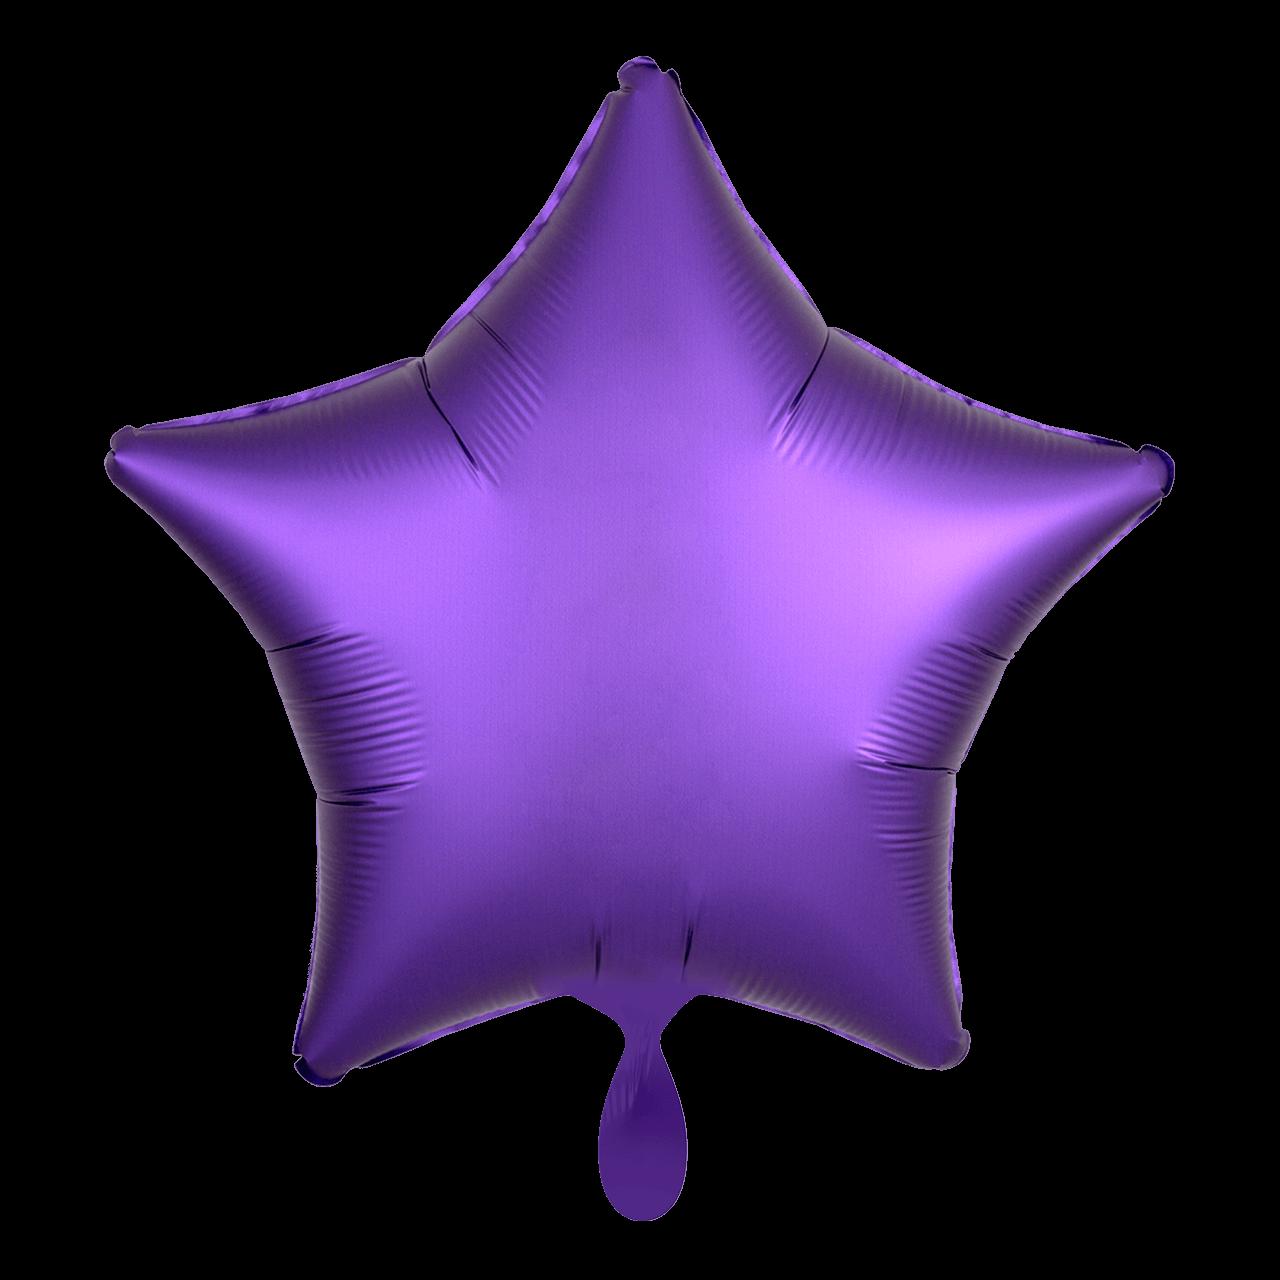 Standard Folienballon Stern - Lila Satin